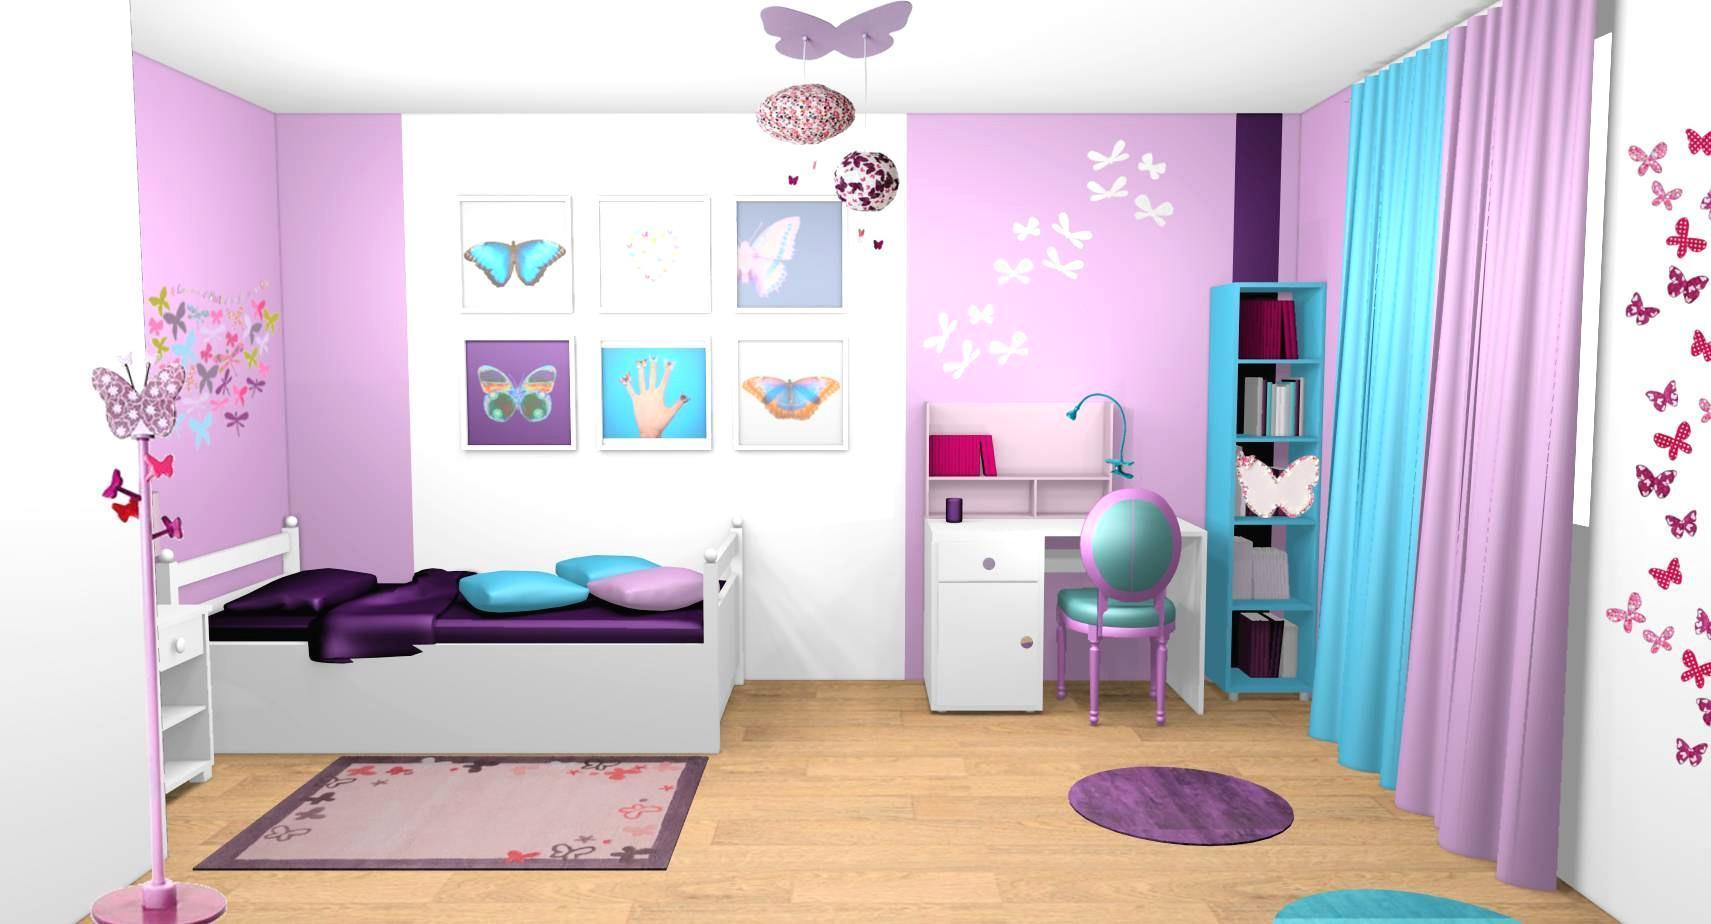 Idee Deco Pour Chambre Fille 12 Ans   Deco Chambre